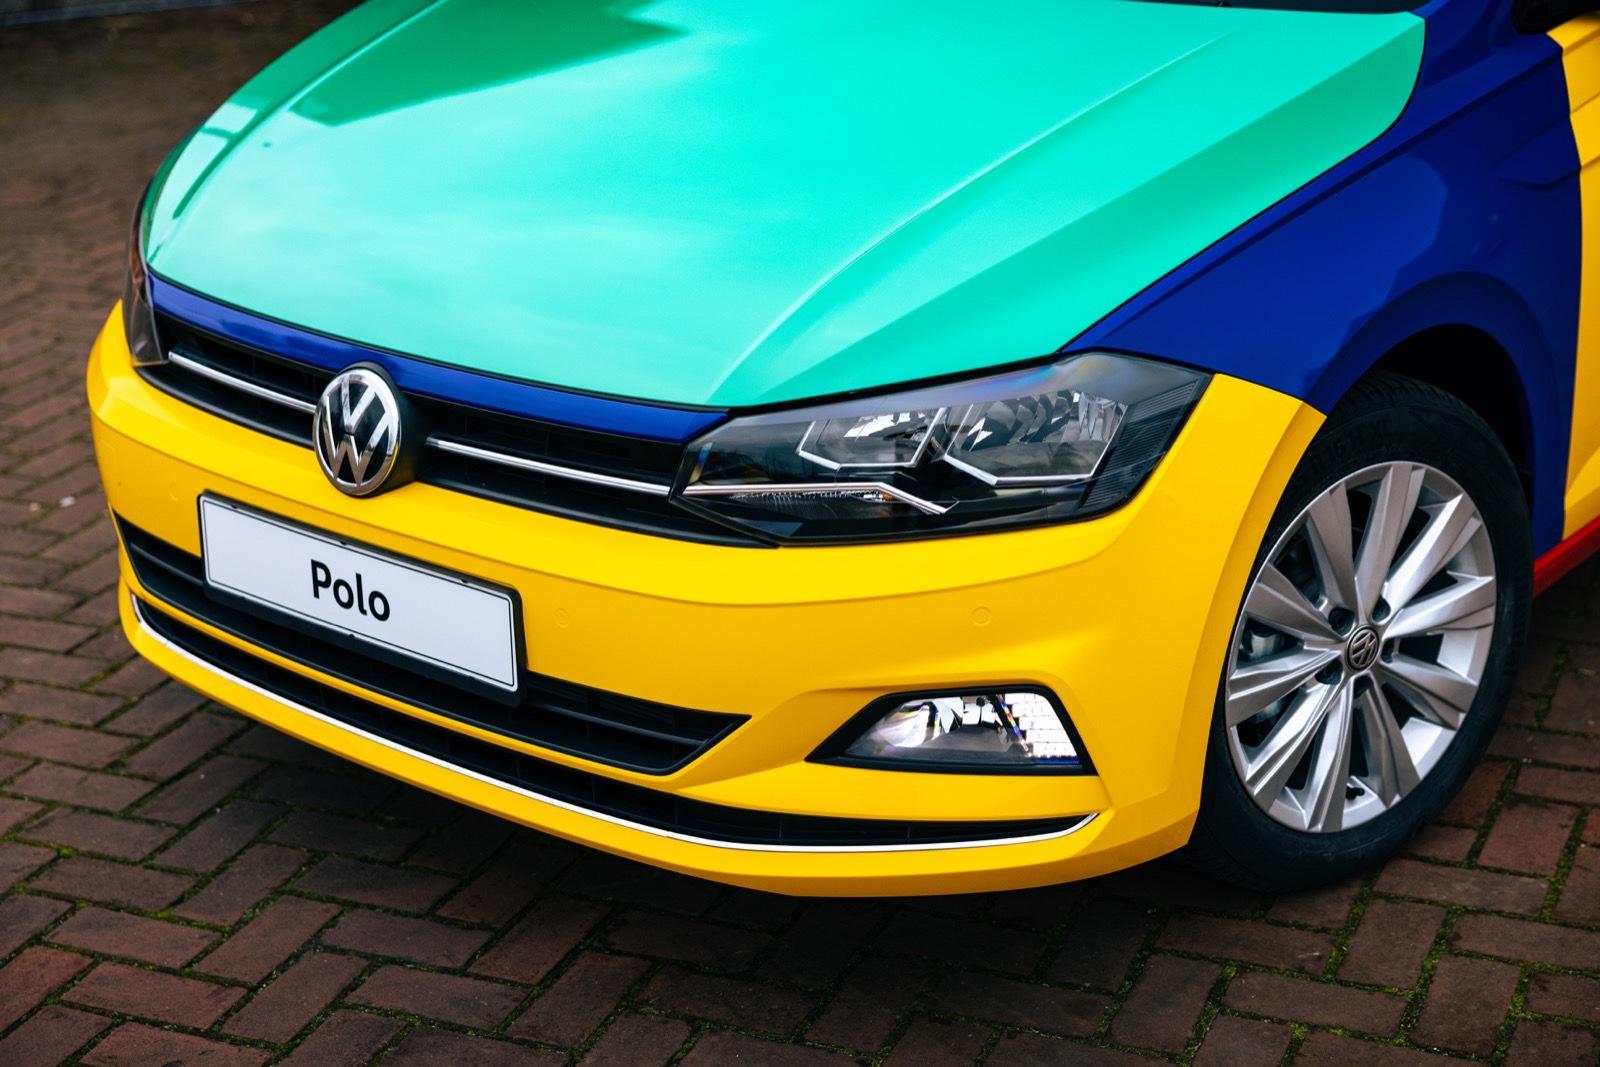 Volkswagen_Netherlands_modern_Polo_Harlekin_0017